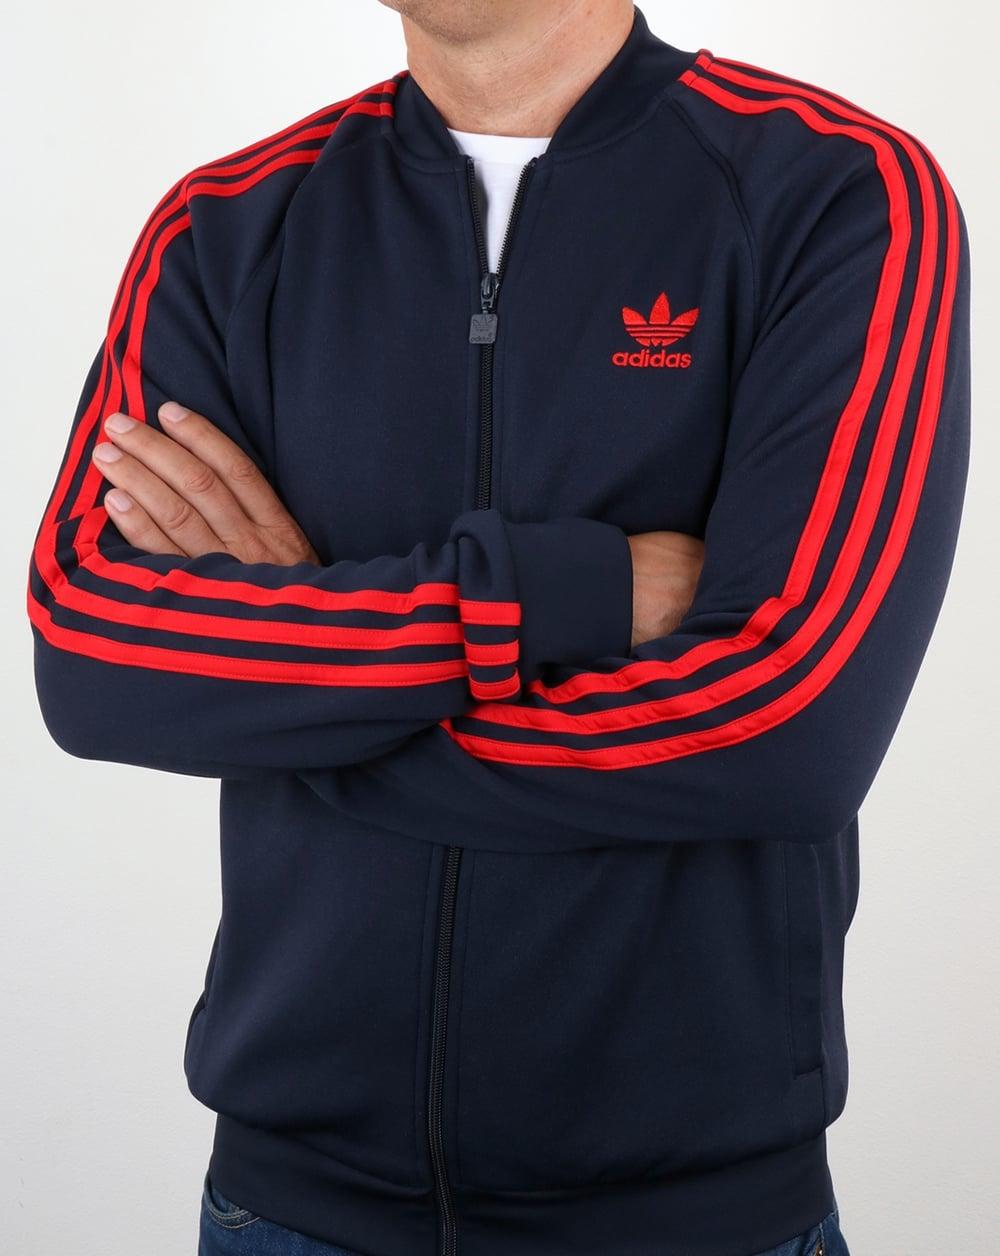 Adidas Originals Superstar Track Top Navy Red Tracksuit